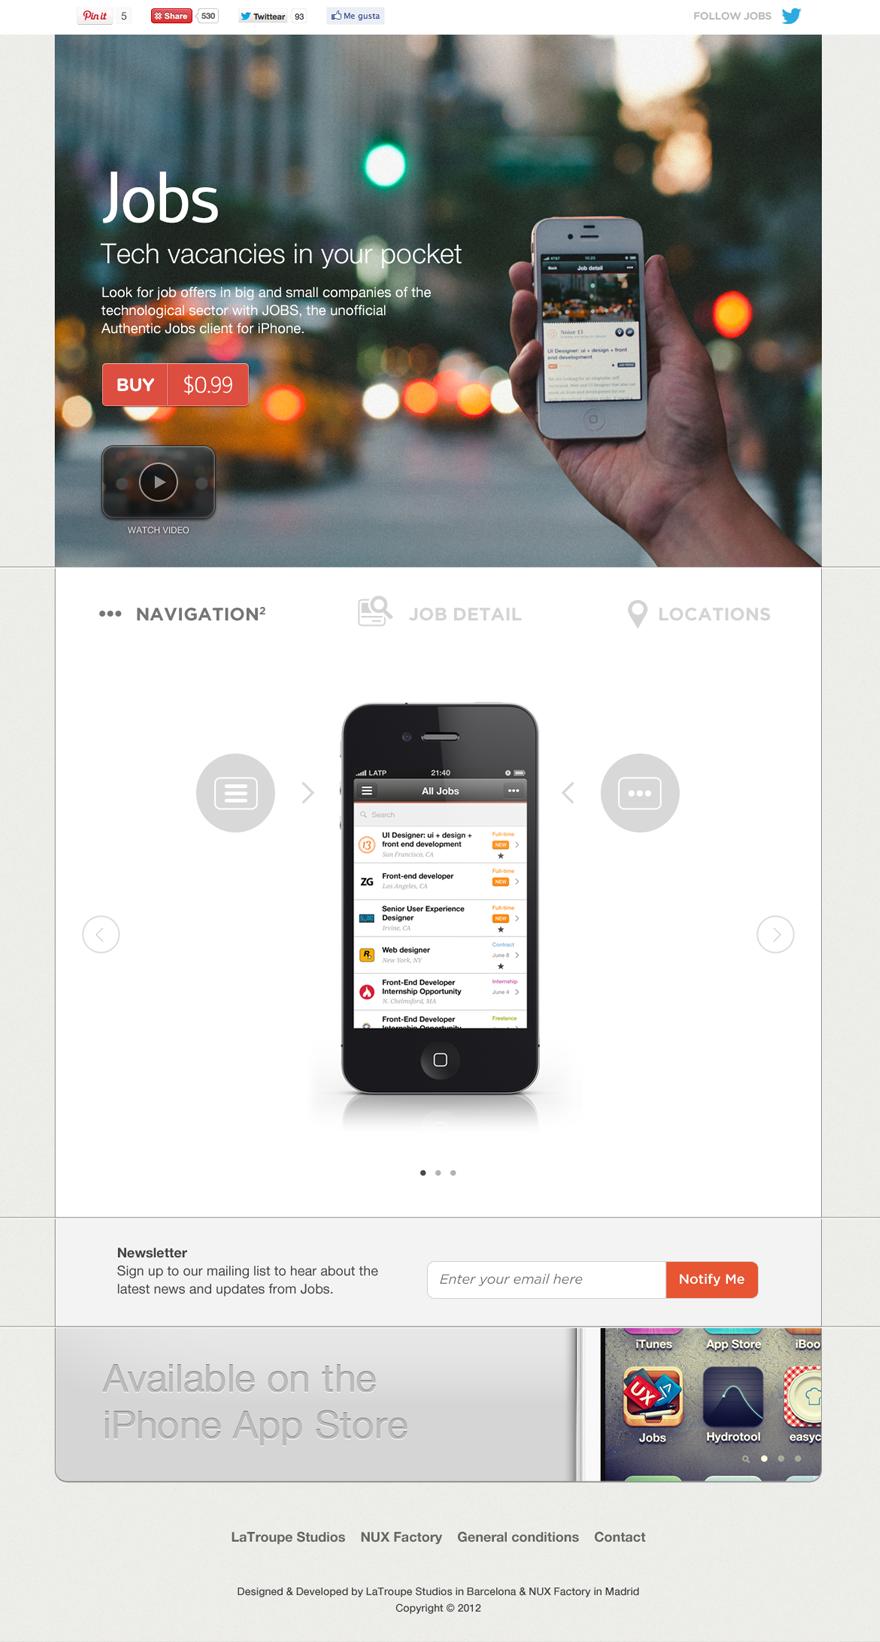 Jobs, tech vacancies in your pocket | Ideas | Mobile app